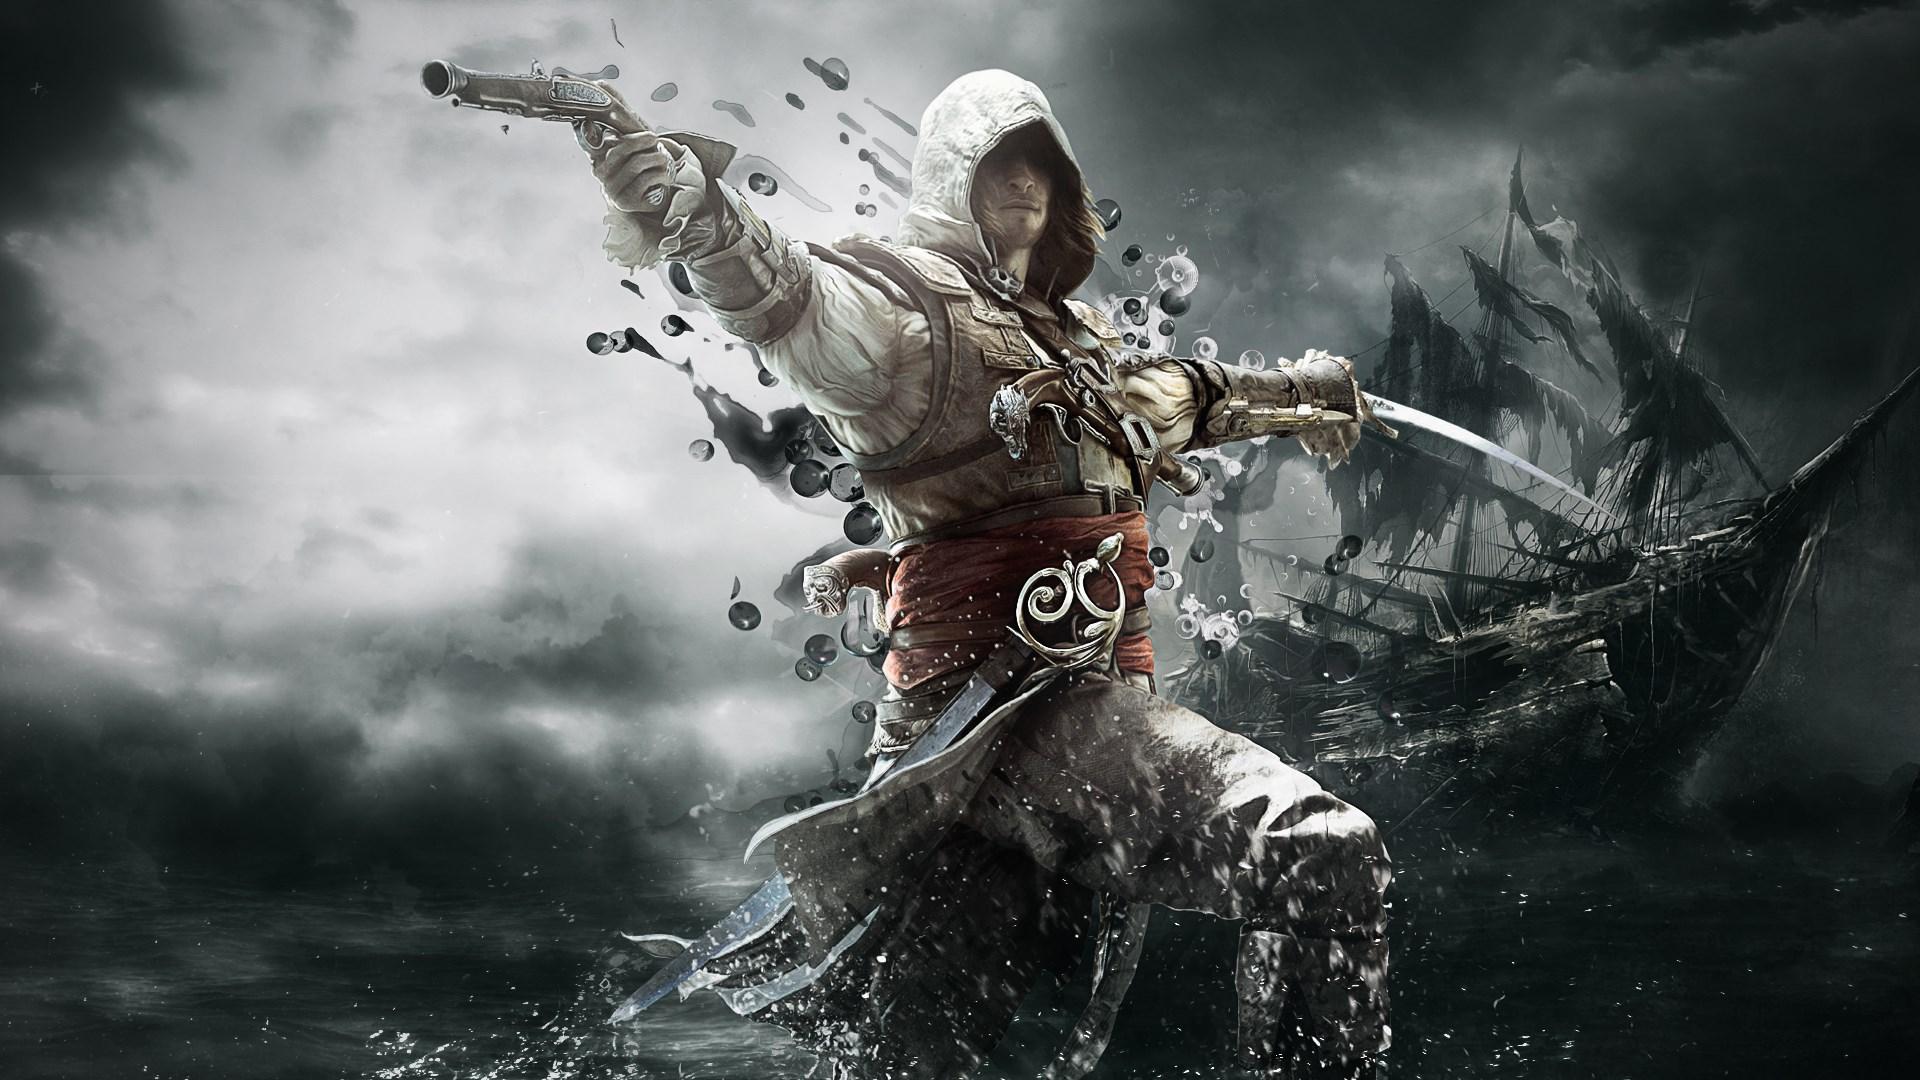 Download Assassins Creed 4 Black Flag Wallpaper HD 2409 Full Size 1920x1080